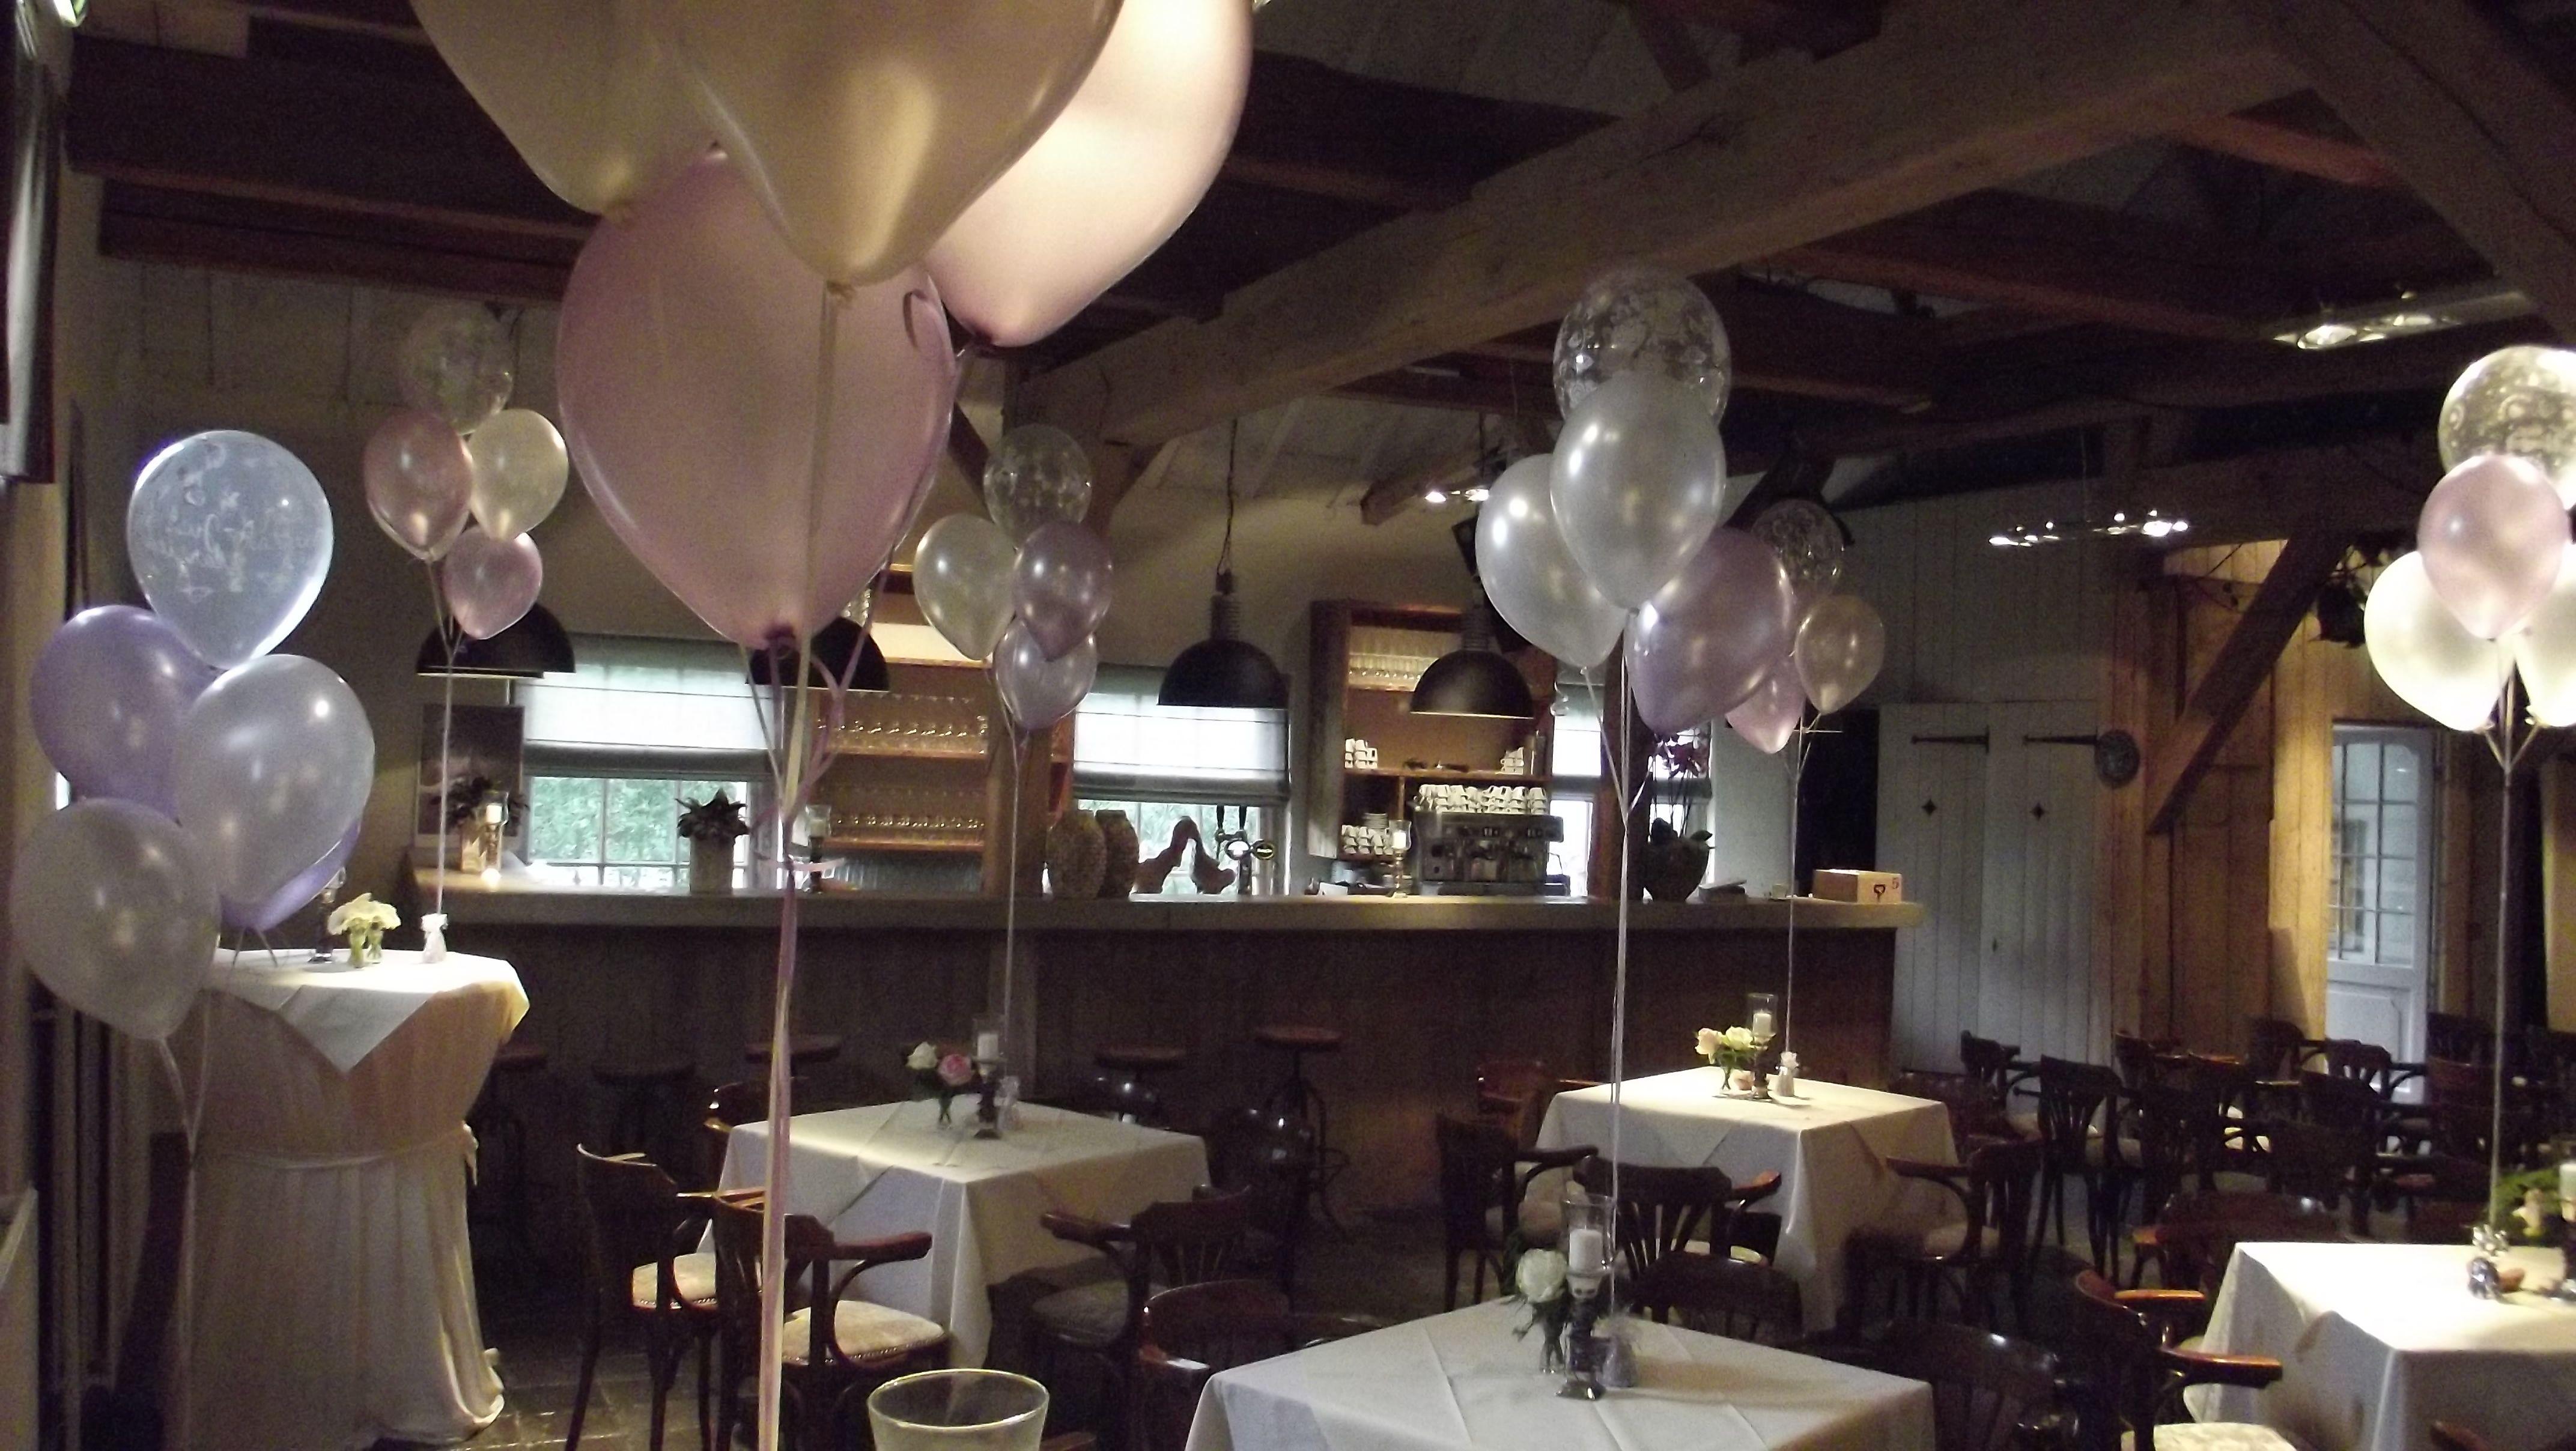 De Boerderij Huizen : Feest de boerderij huizen ballondecoratie in zalen en